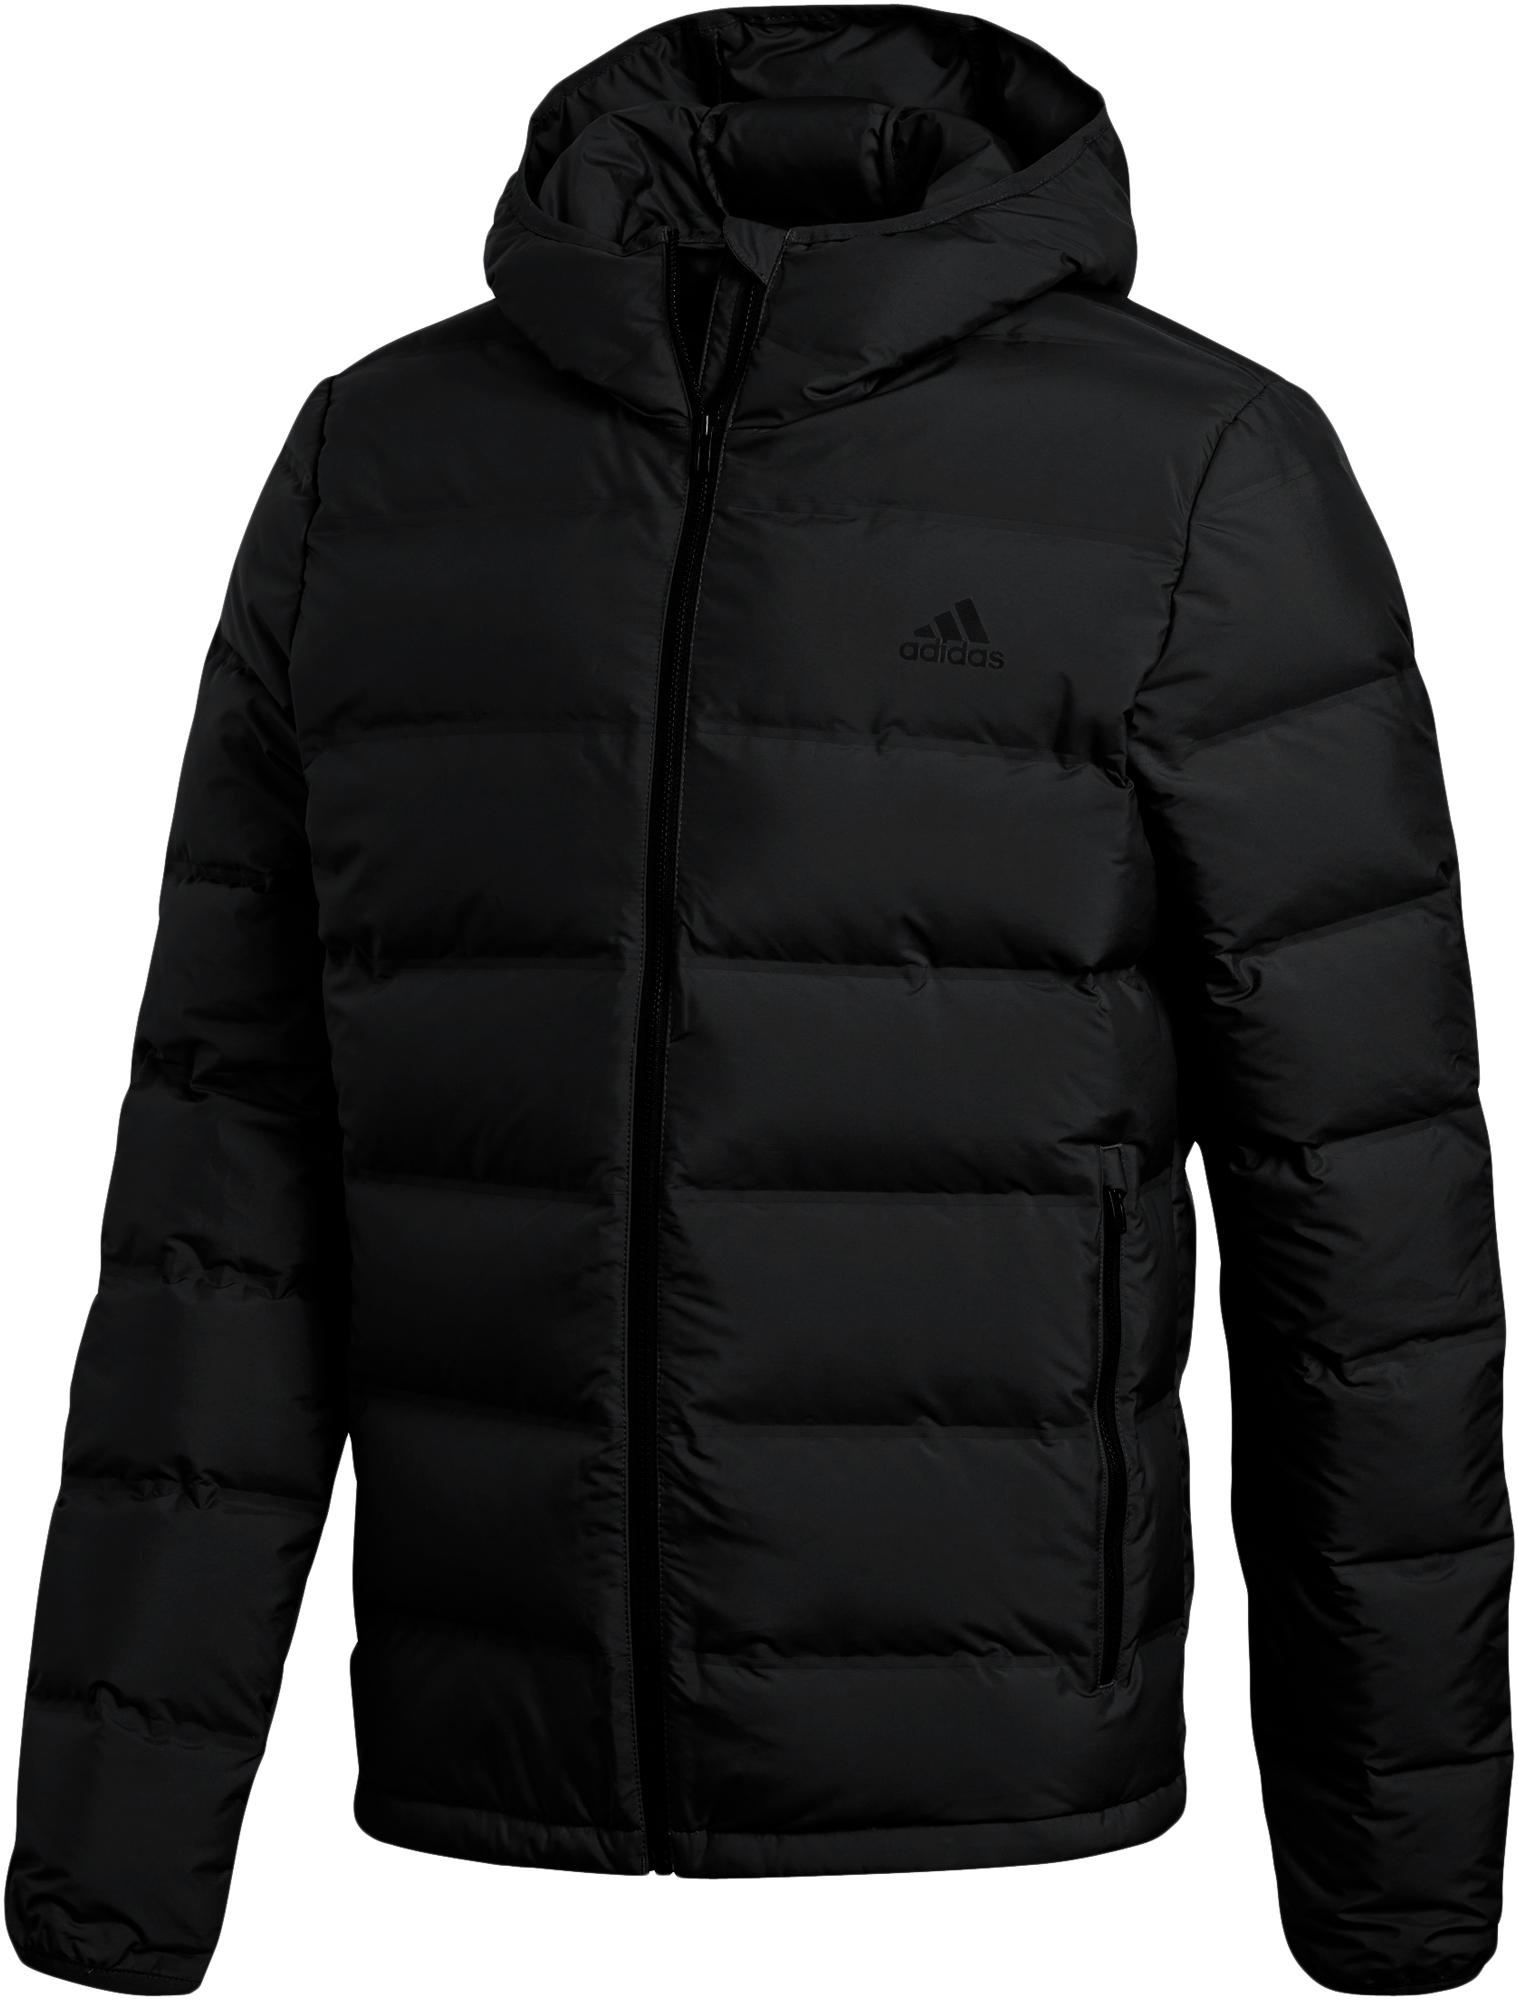 Adidas Пуховик мужской adidas Helionic Hooded, размер 40-42